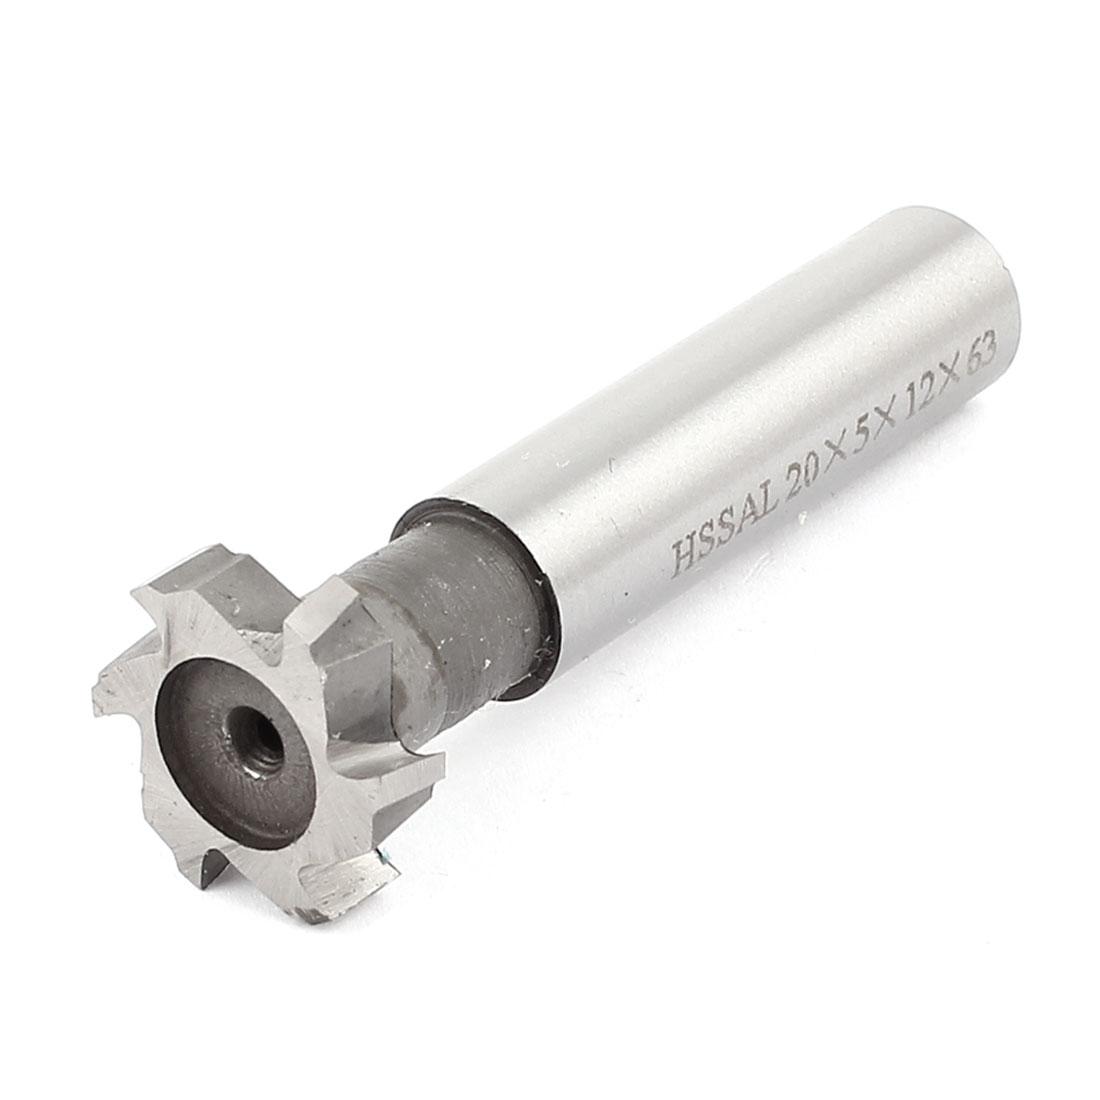 20mm Cutting Dia 5mm Depth HSS-AL 6 Flutes T Slot End Mill Cutter 63mm Long